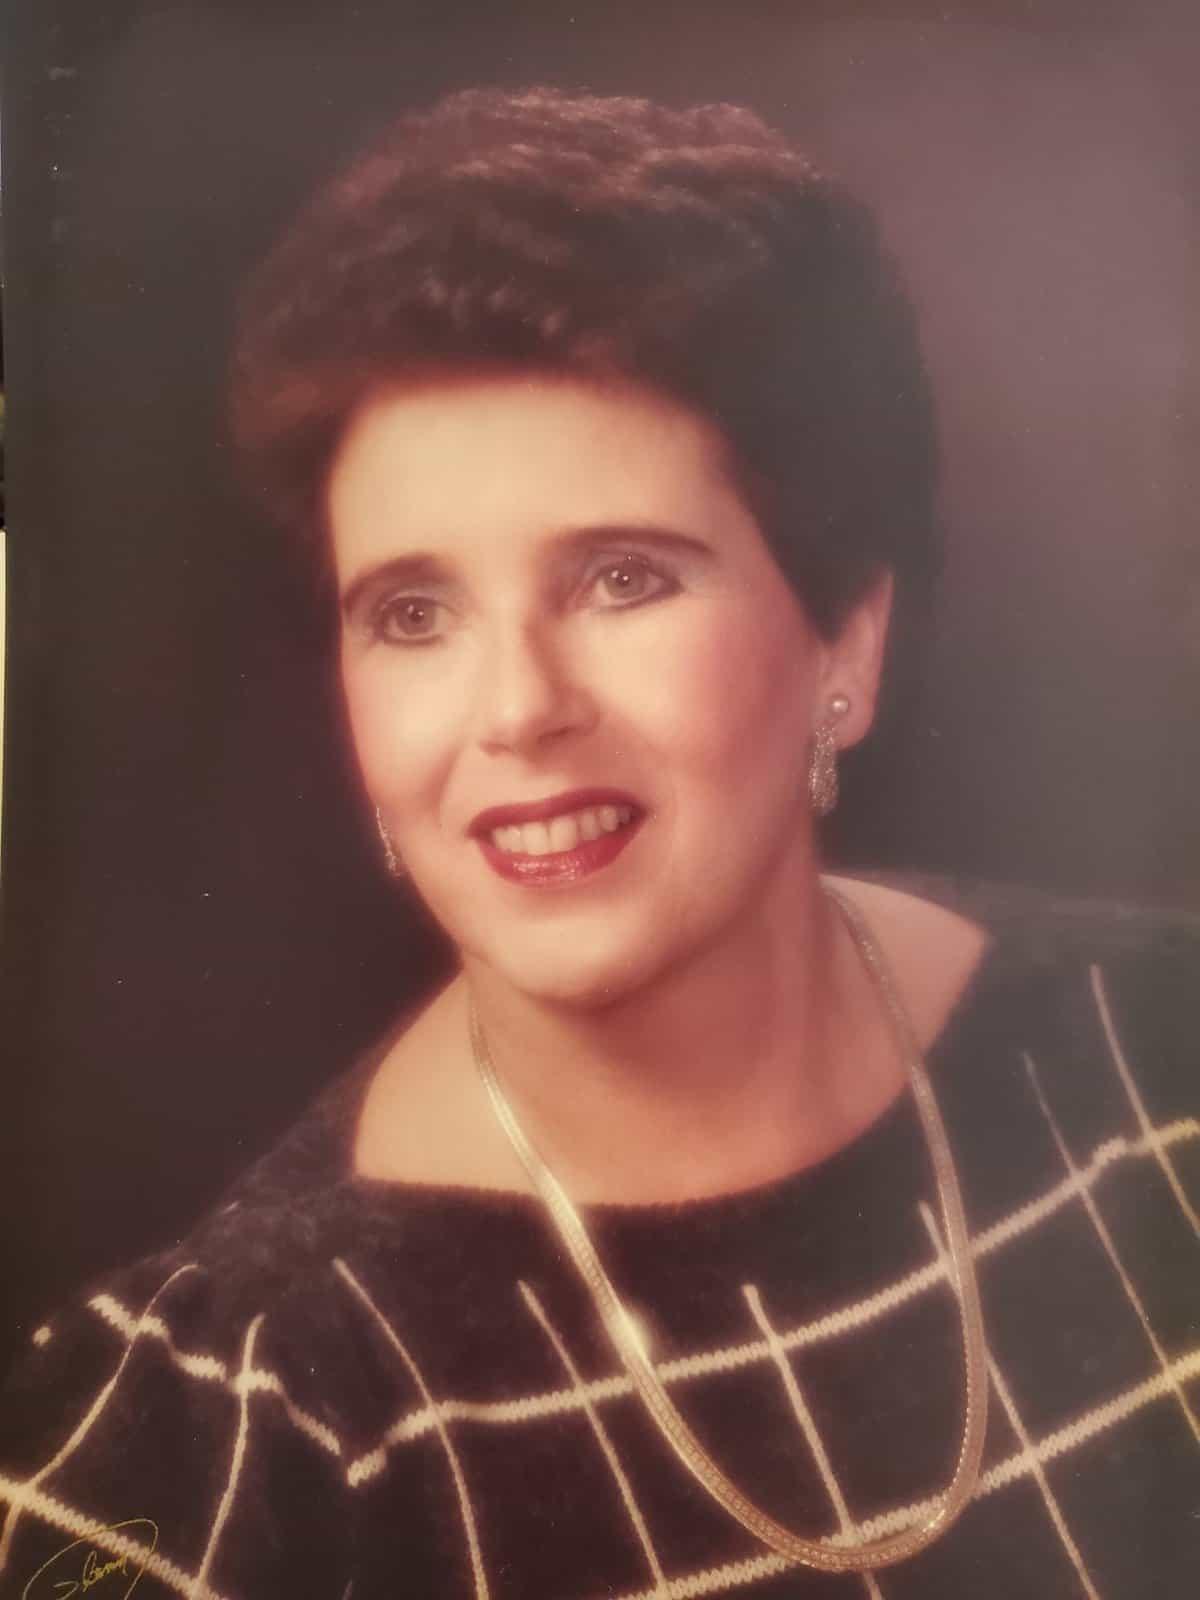 Obituary for MaryLou Haywood Copenhaver